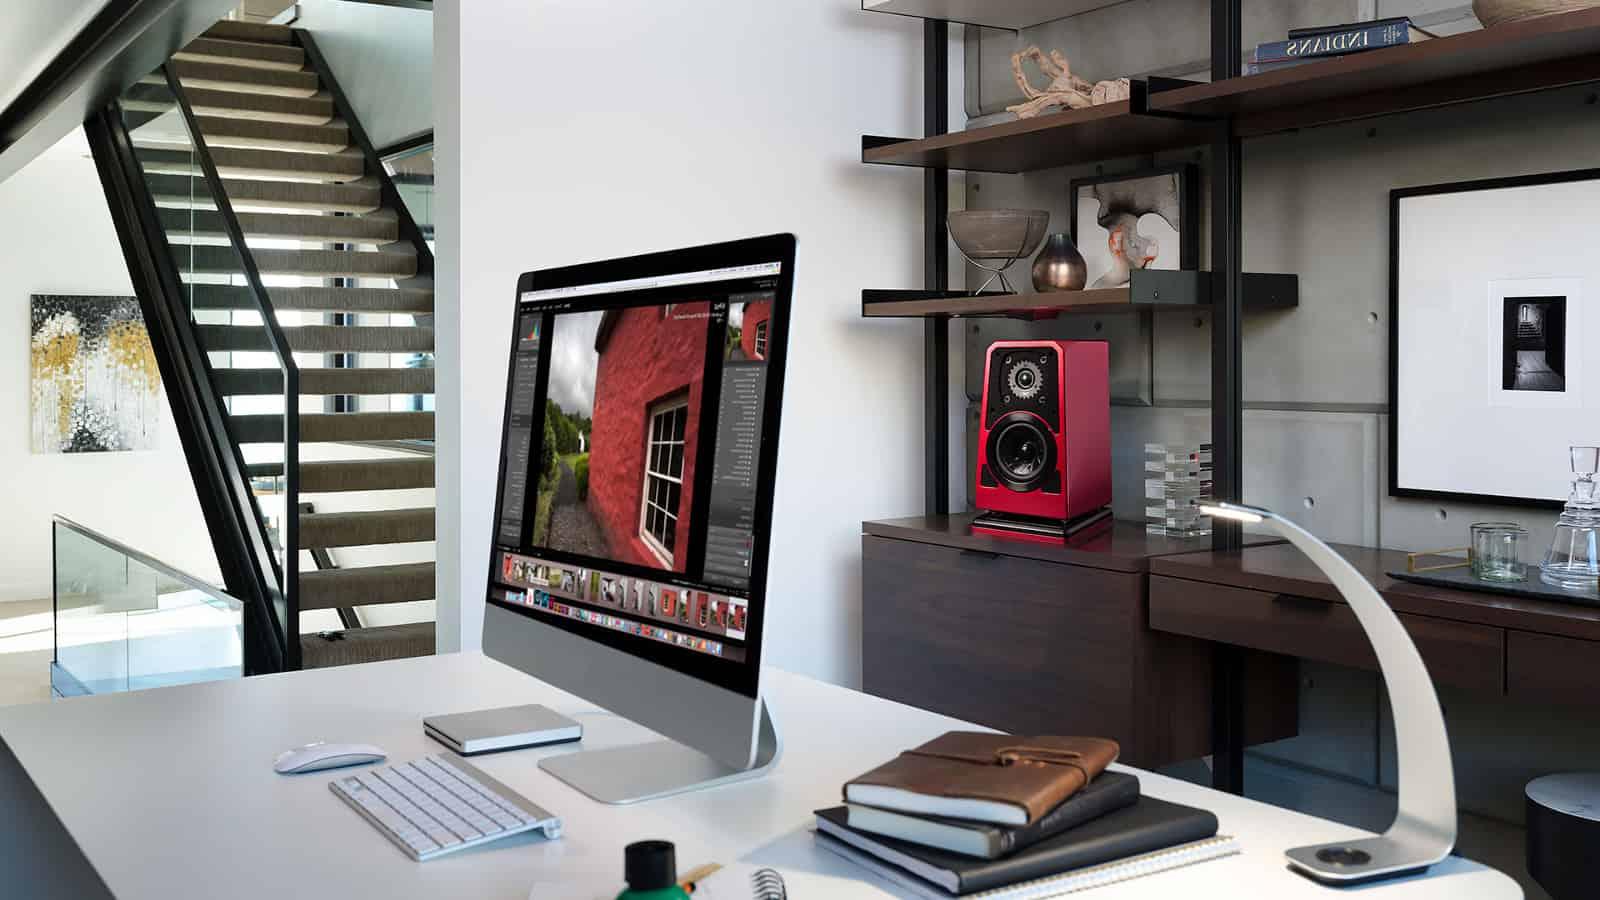 wilson-audio-tunetot-bookshelf-loudspeaker